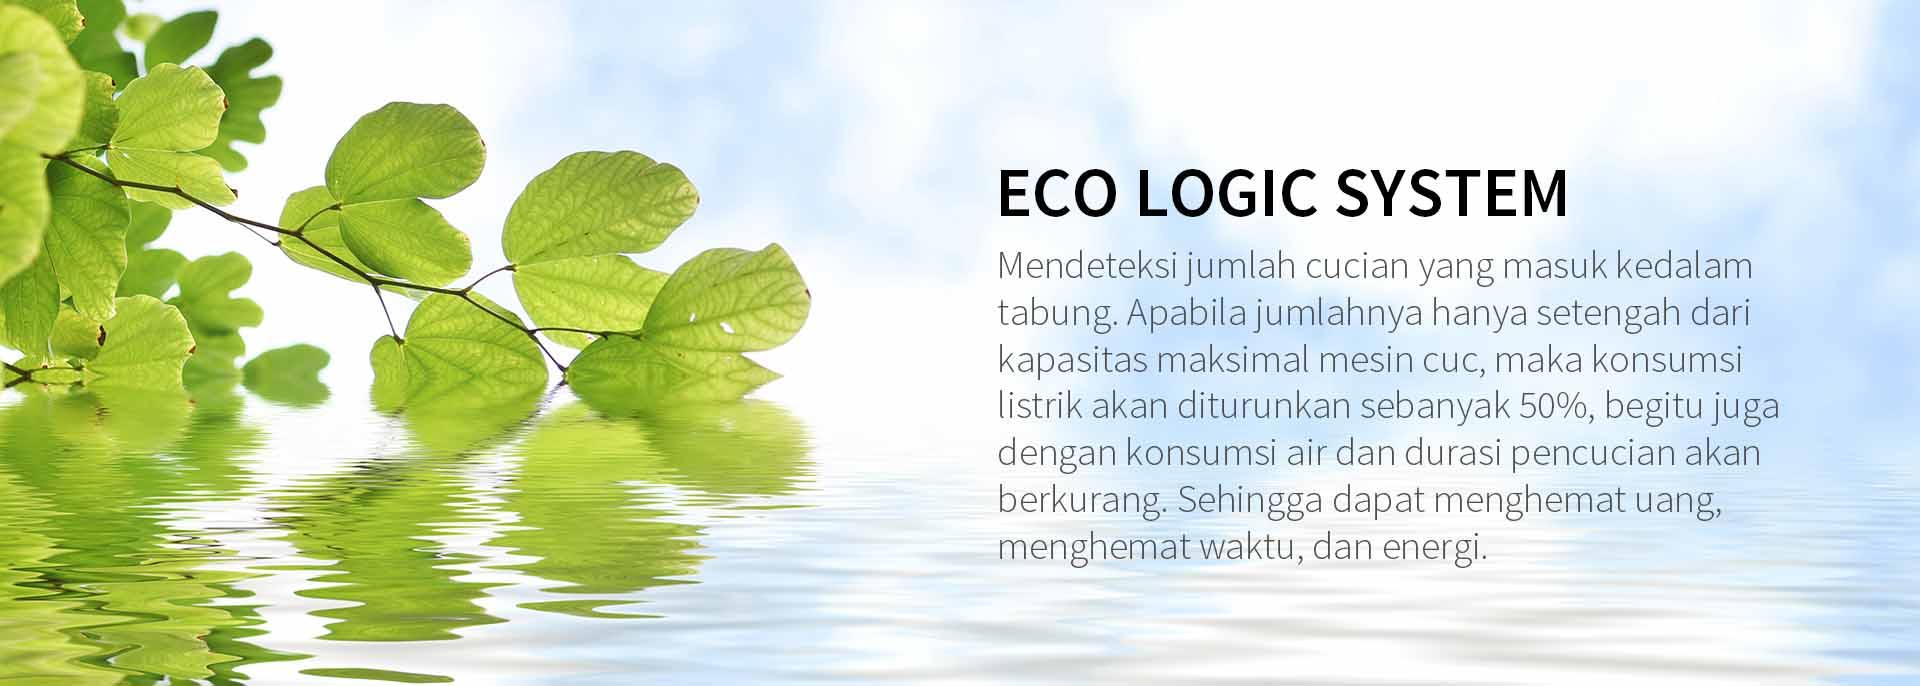 Eco%20Logic%20System%203_0.jpg